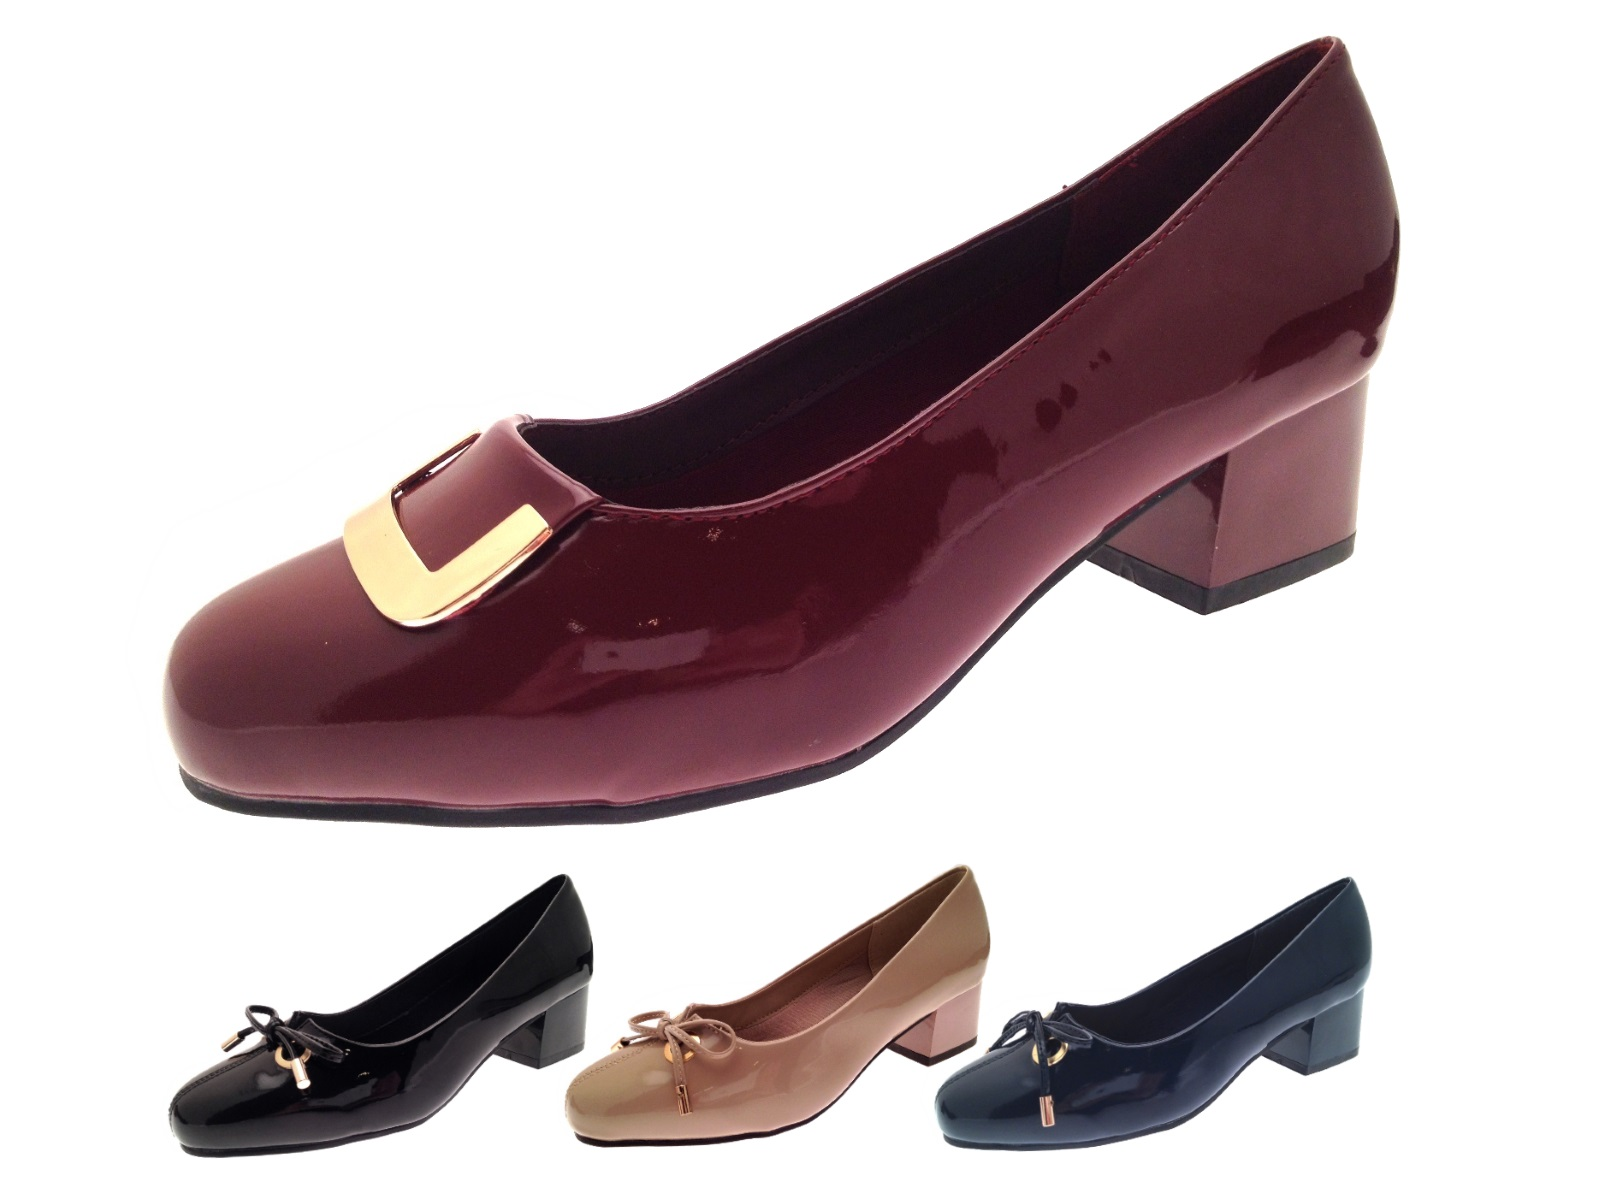 36896b8ec55 Womens Patent Low Block Heels Wide Fit Comfort Court Shoes Ladies Size UK 3  - 8